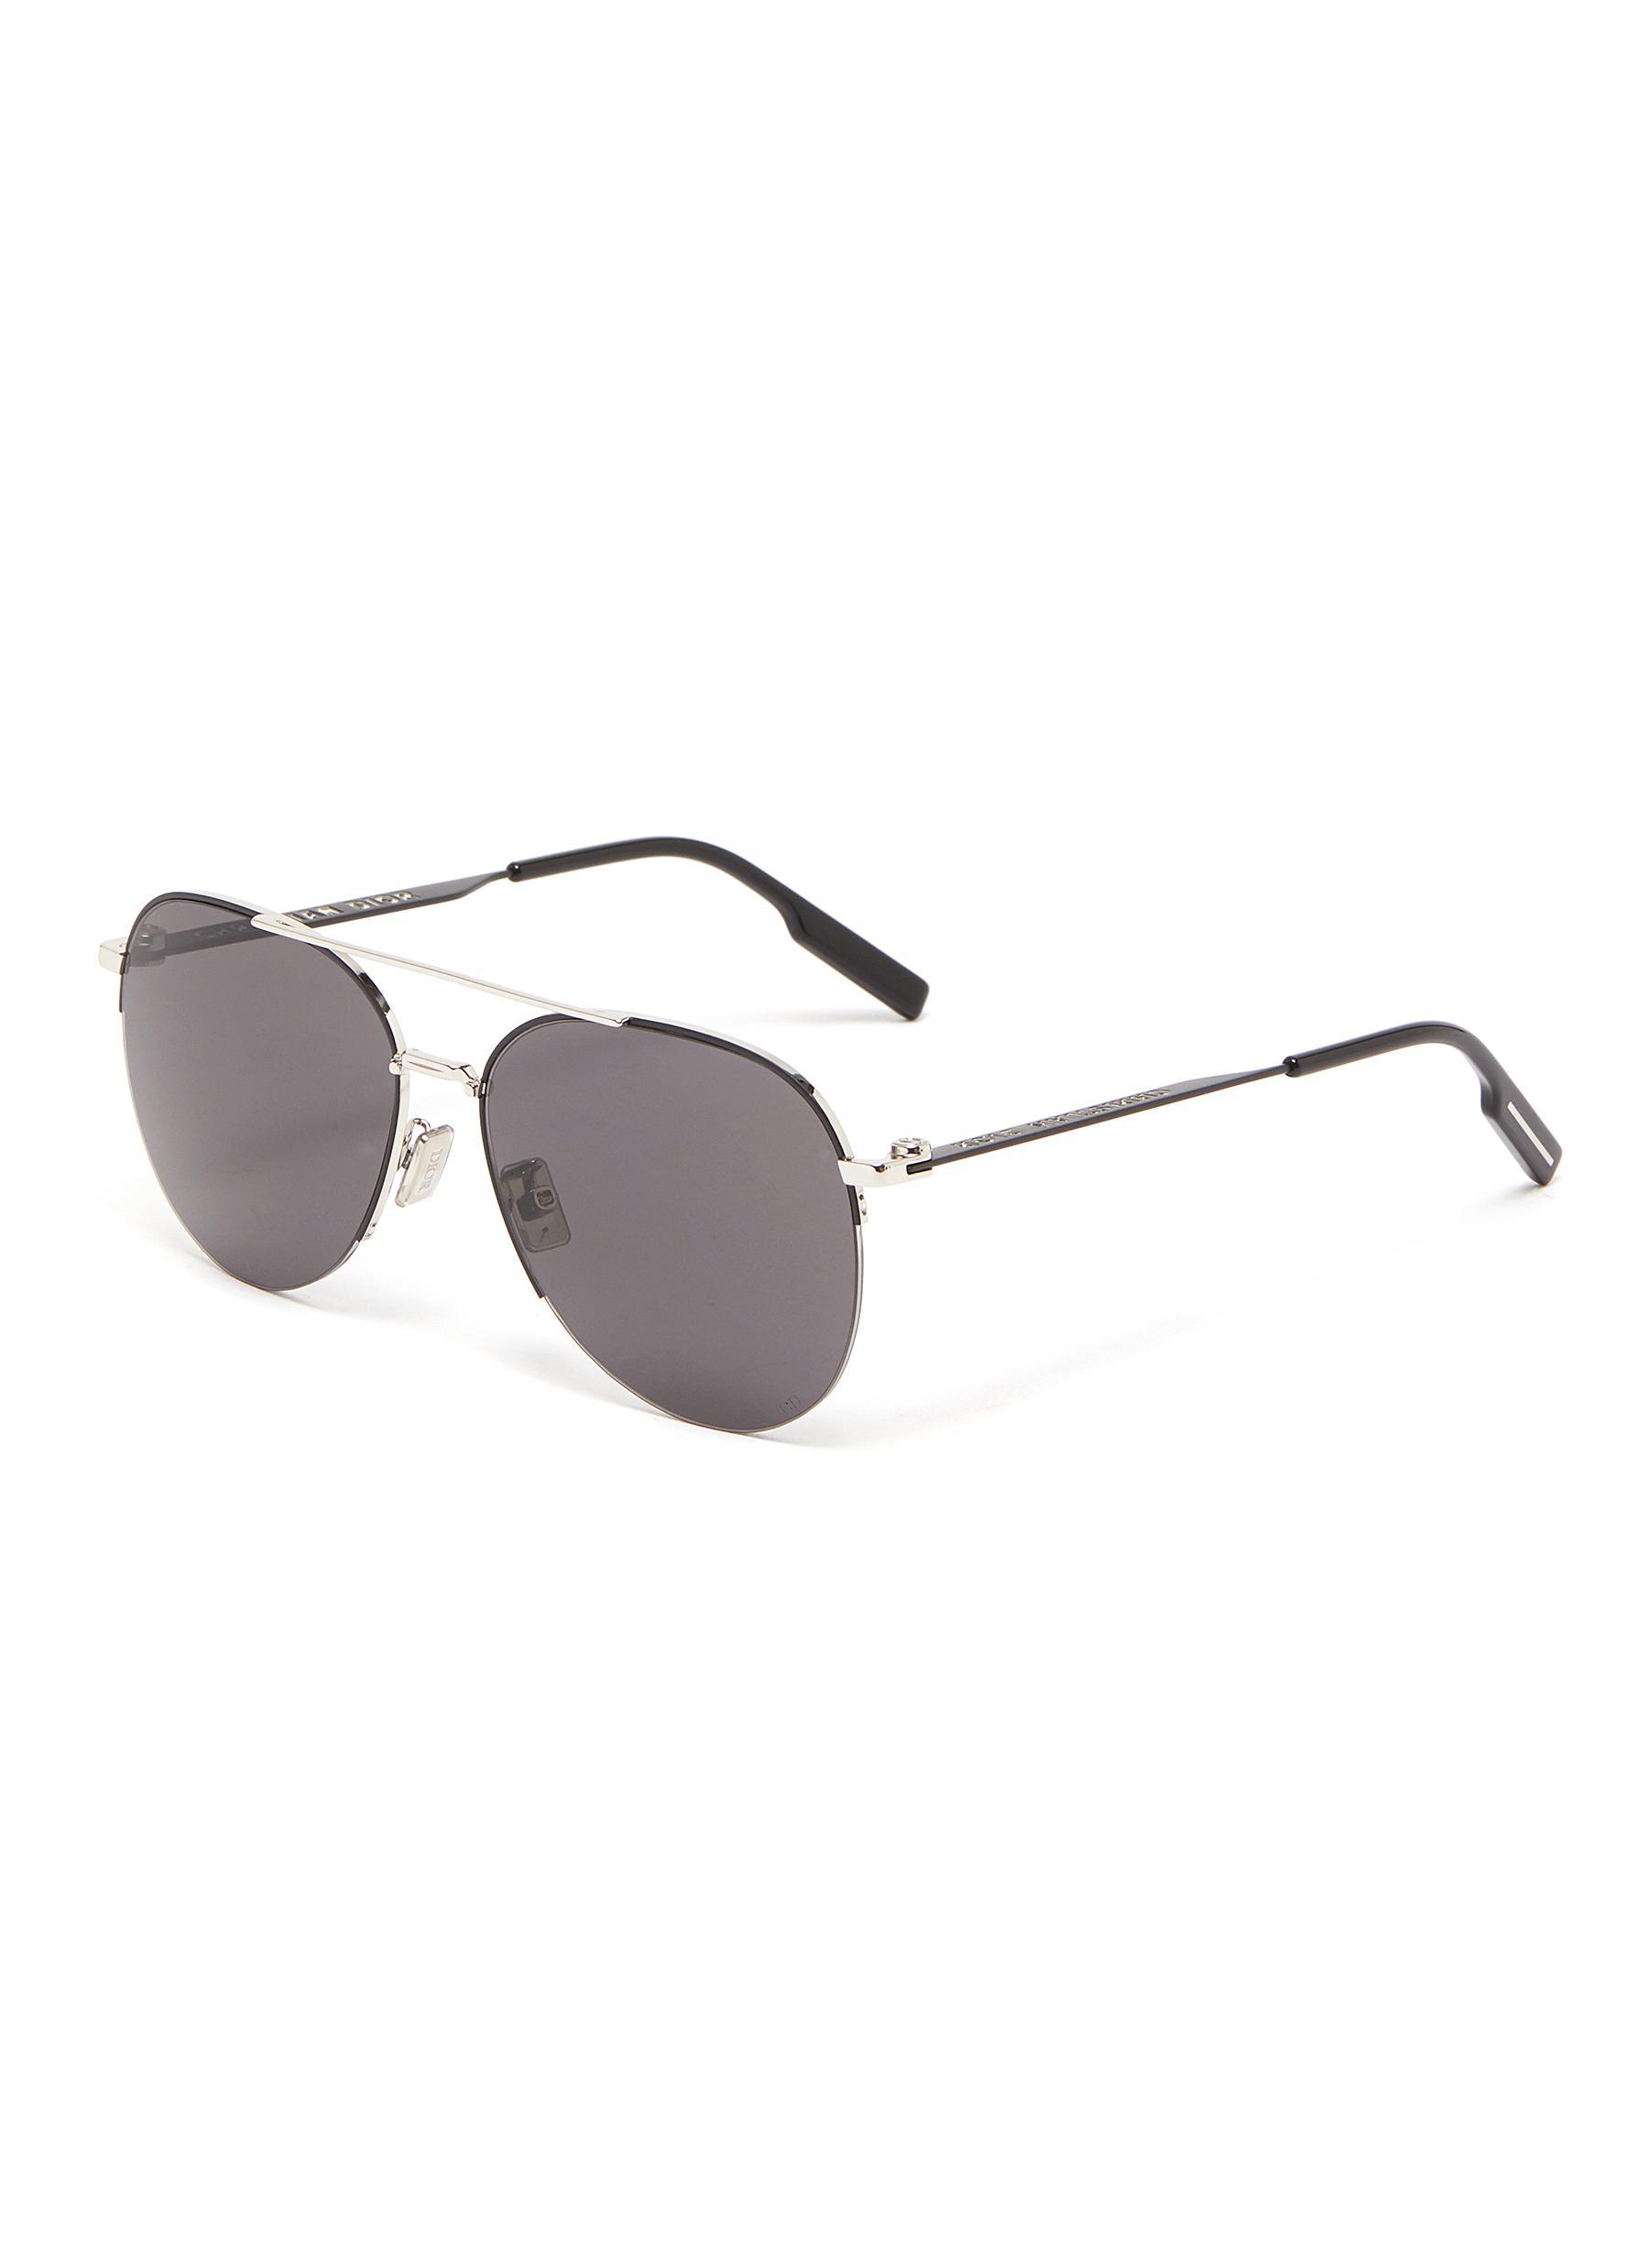 Dior Sunglasses 'DIOR180° AU' DOUBLE BRIDGE METAL FRAME AVIATOR SUNGLASSES